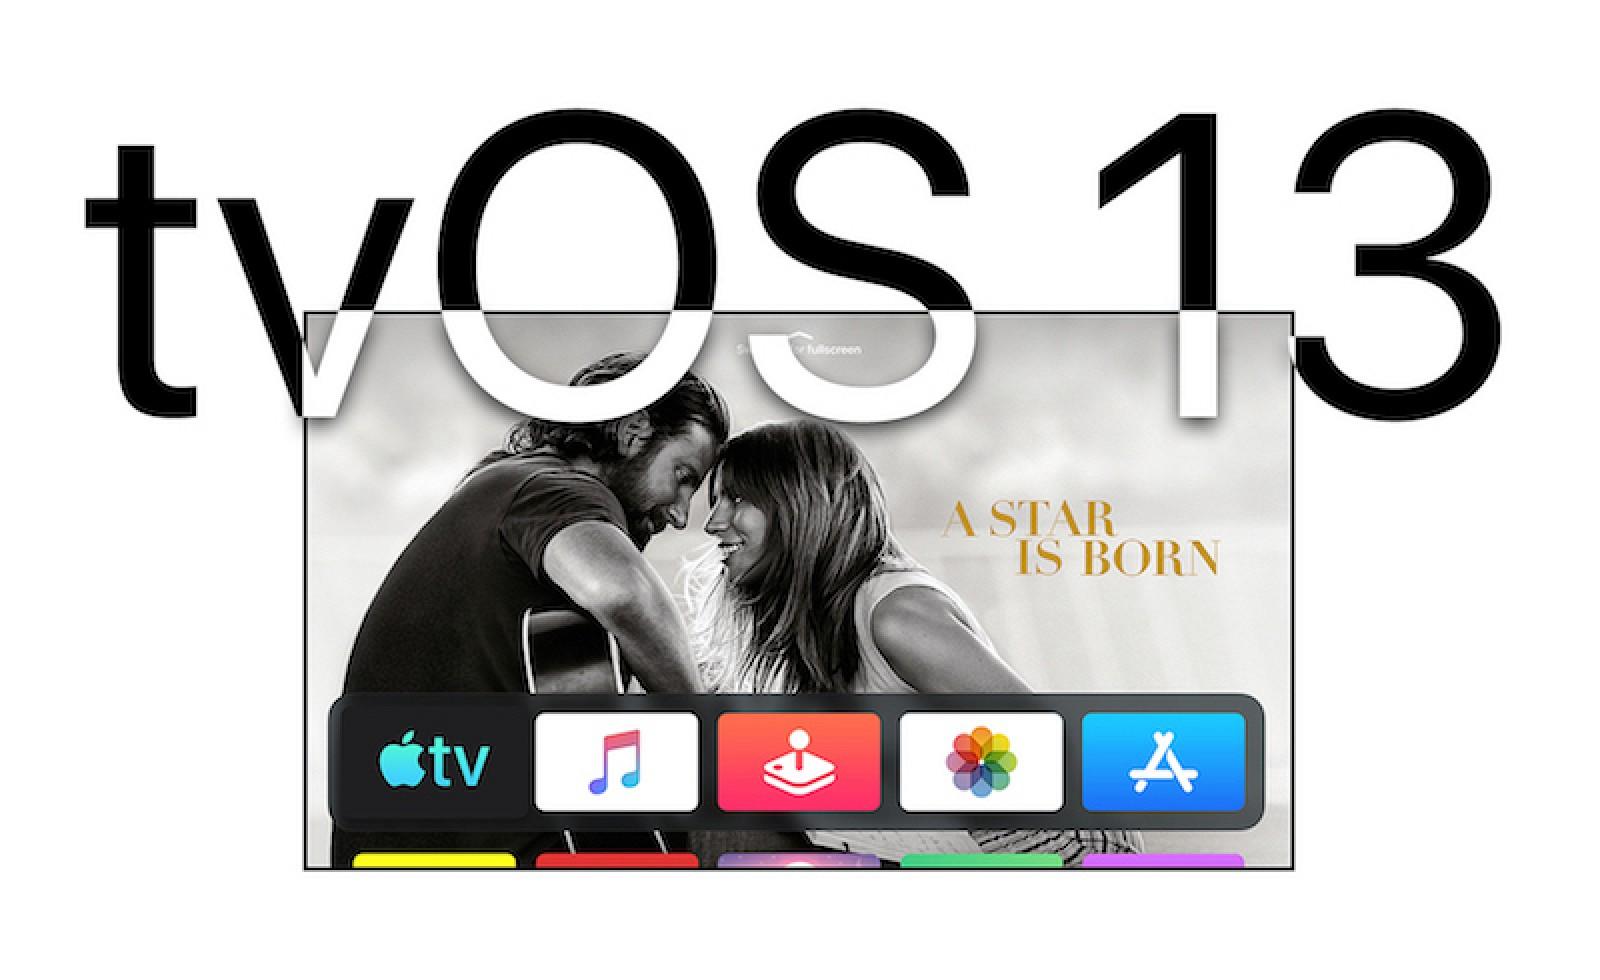 Apple Seeds First Beta de TVOS 13 a Public Beta Testers